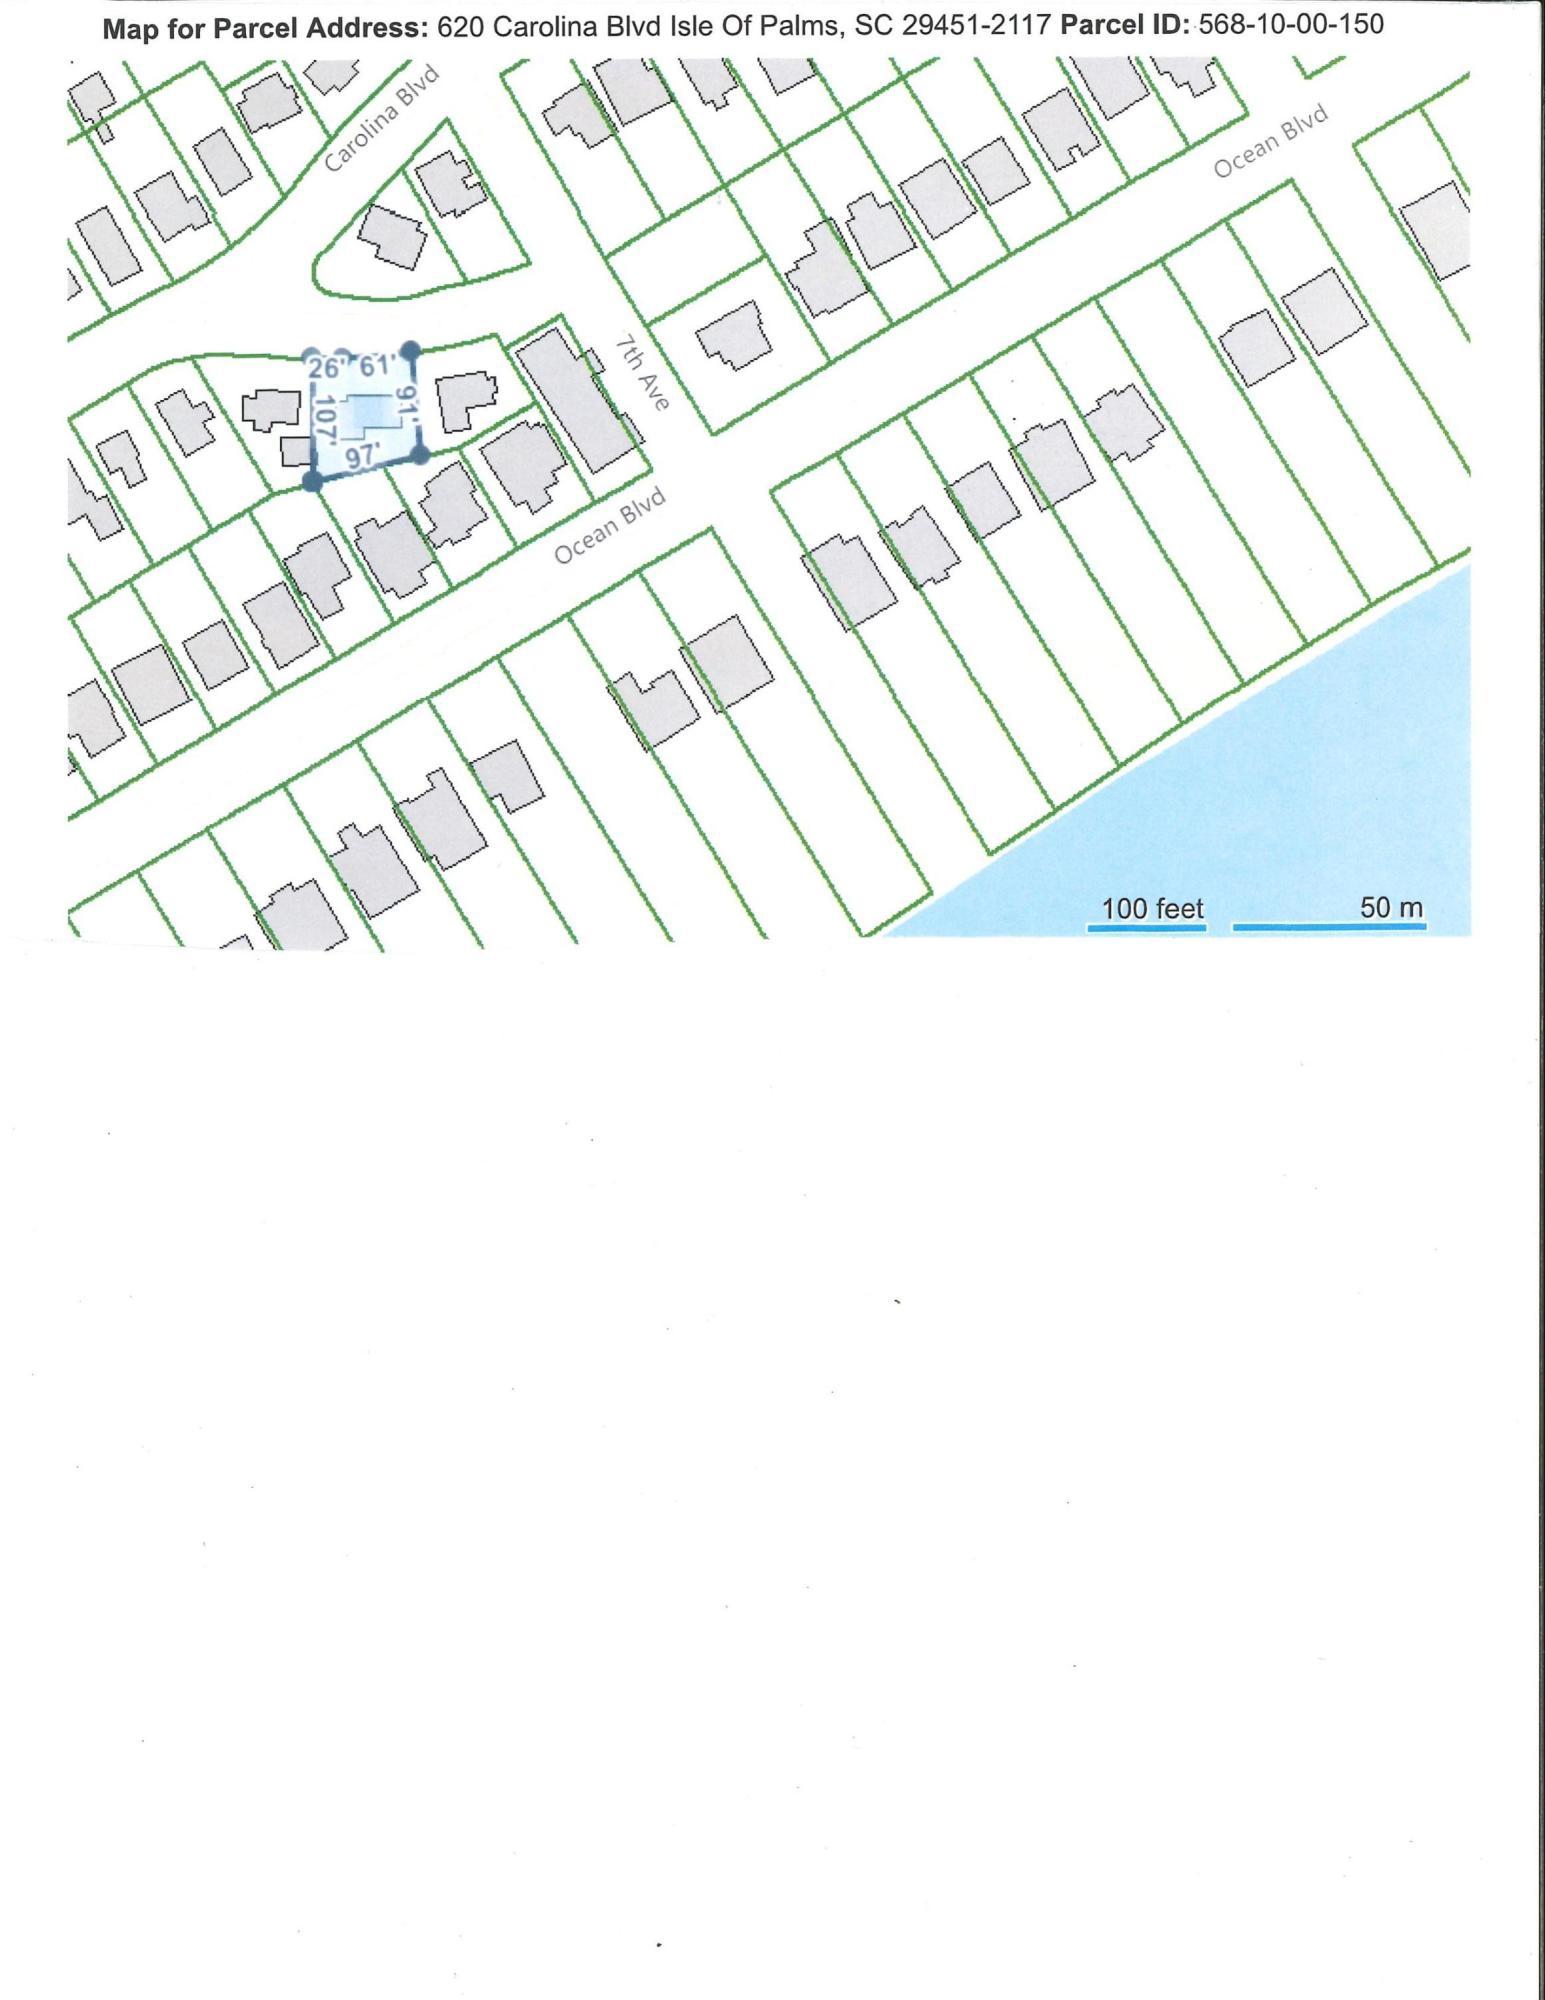 620 Carolina Boulevard Isle Of Palms, SC 29451